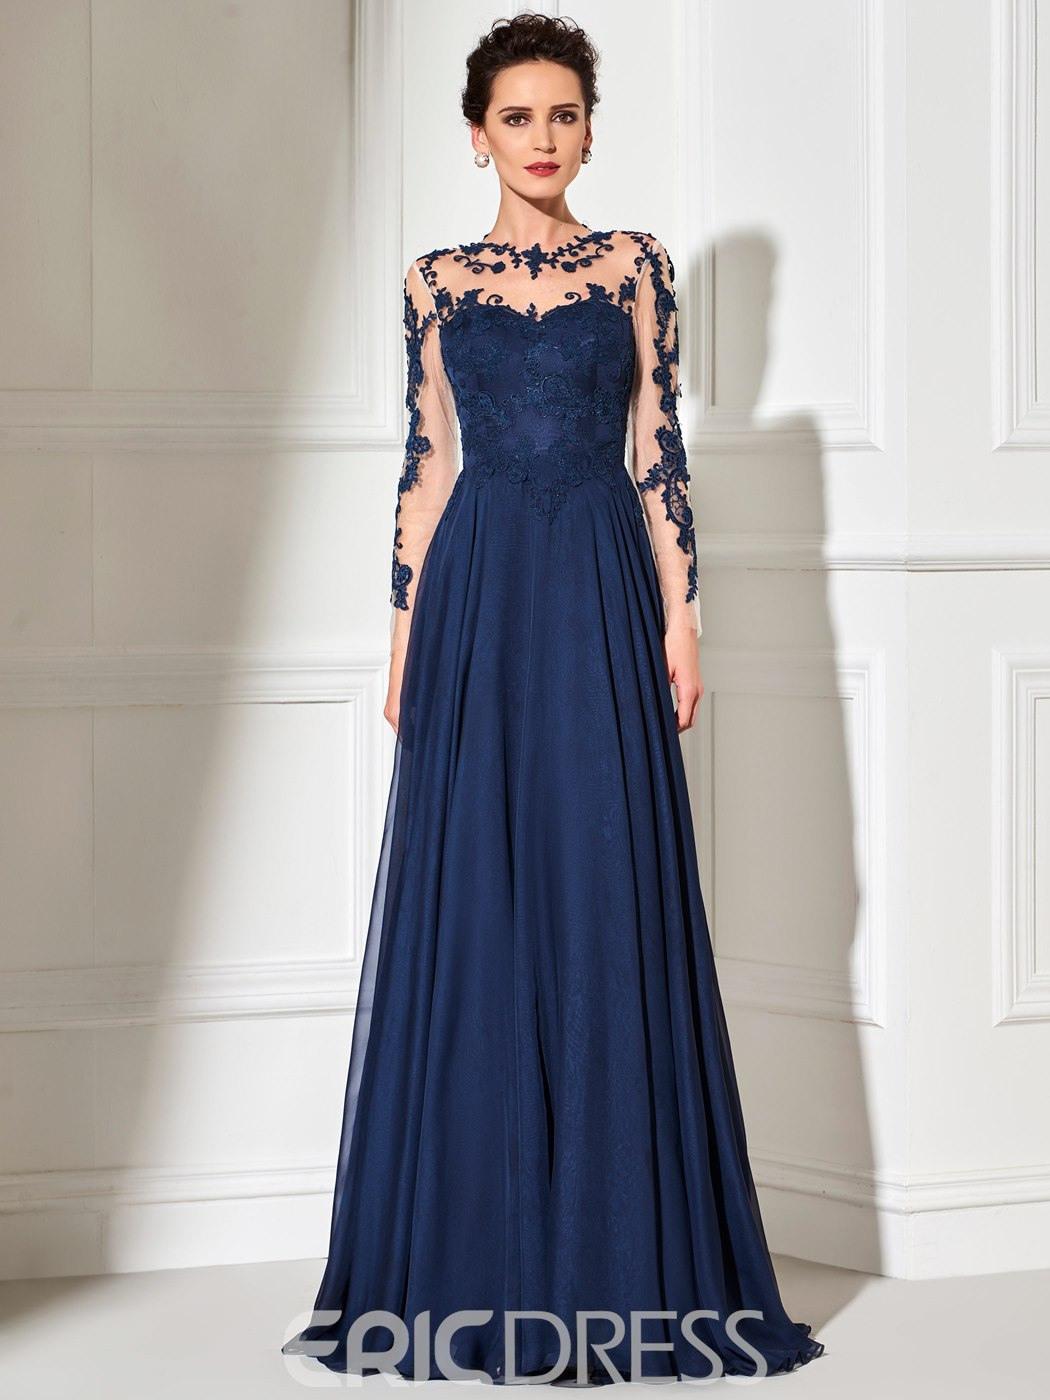 Abend Perfekt Abendkleid Lange Ärmel StylishDesigner Fantastisch Abendkleid Lange Ärmel Boutique